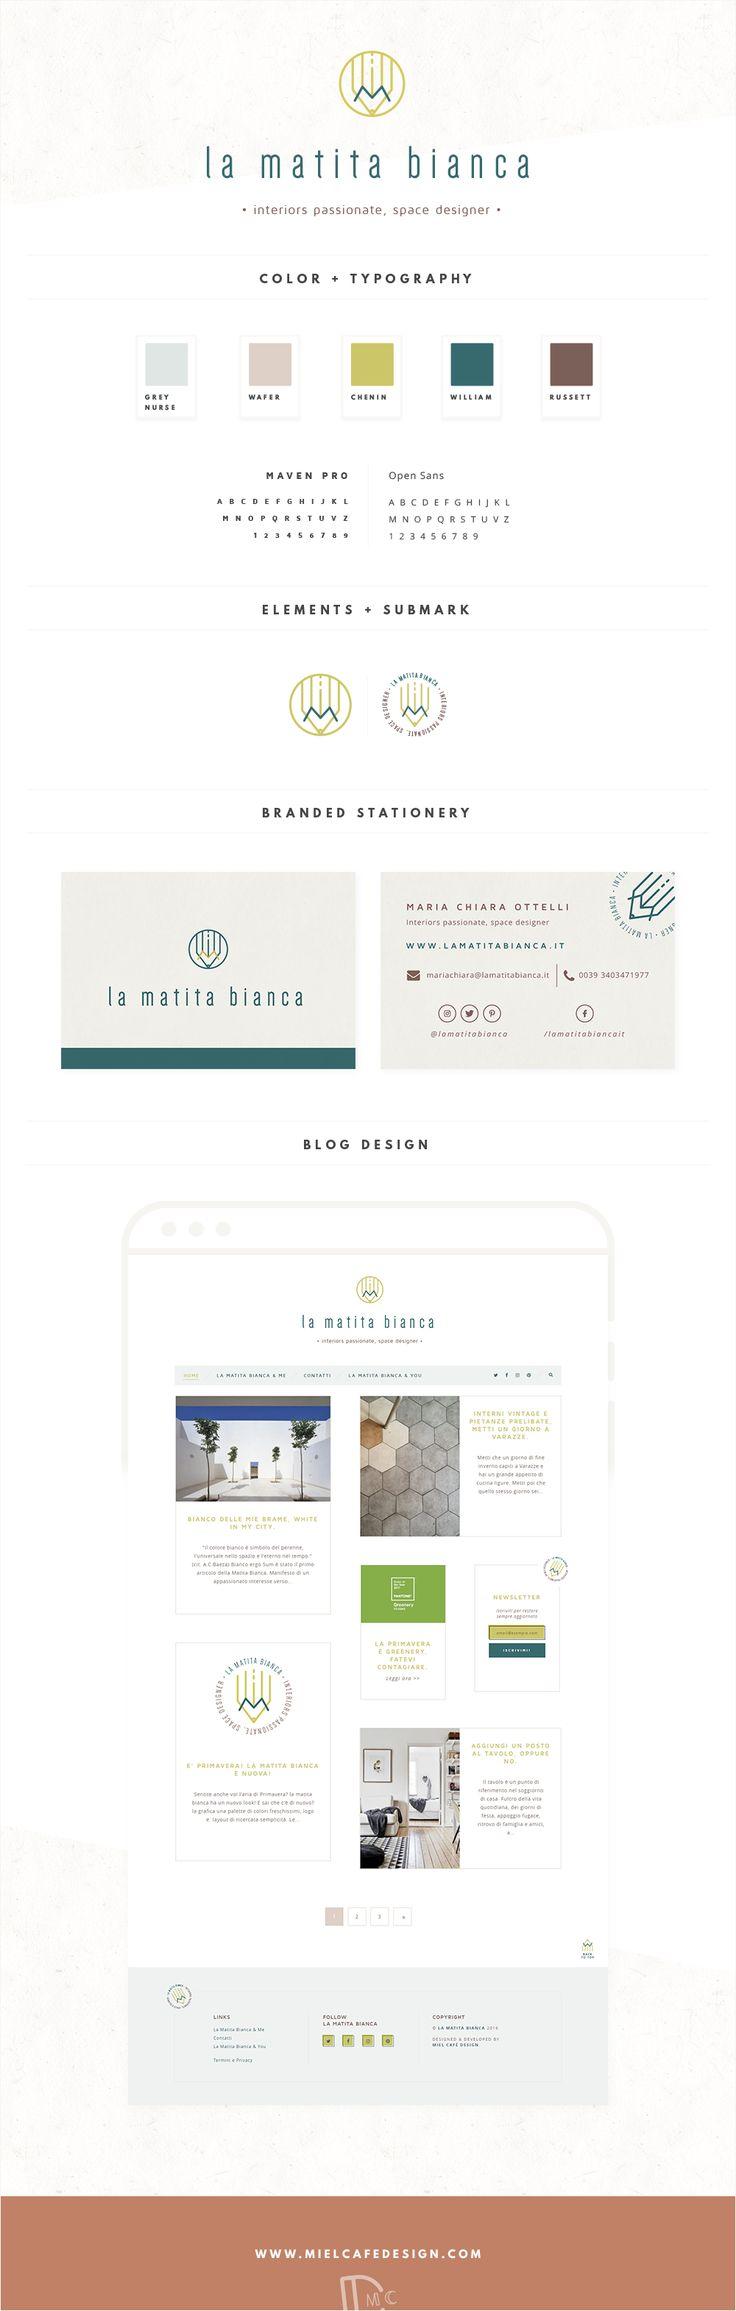 Custom Blog Design & Branding for interior blog La Matita Bianca